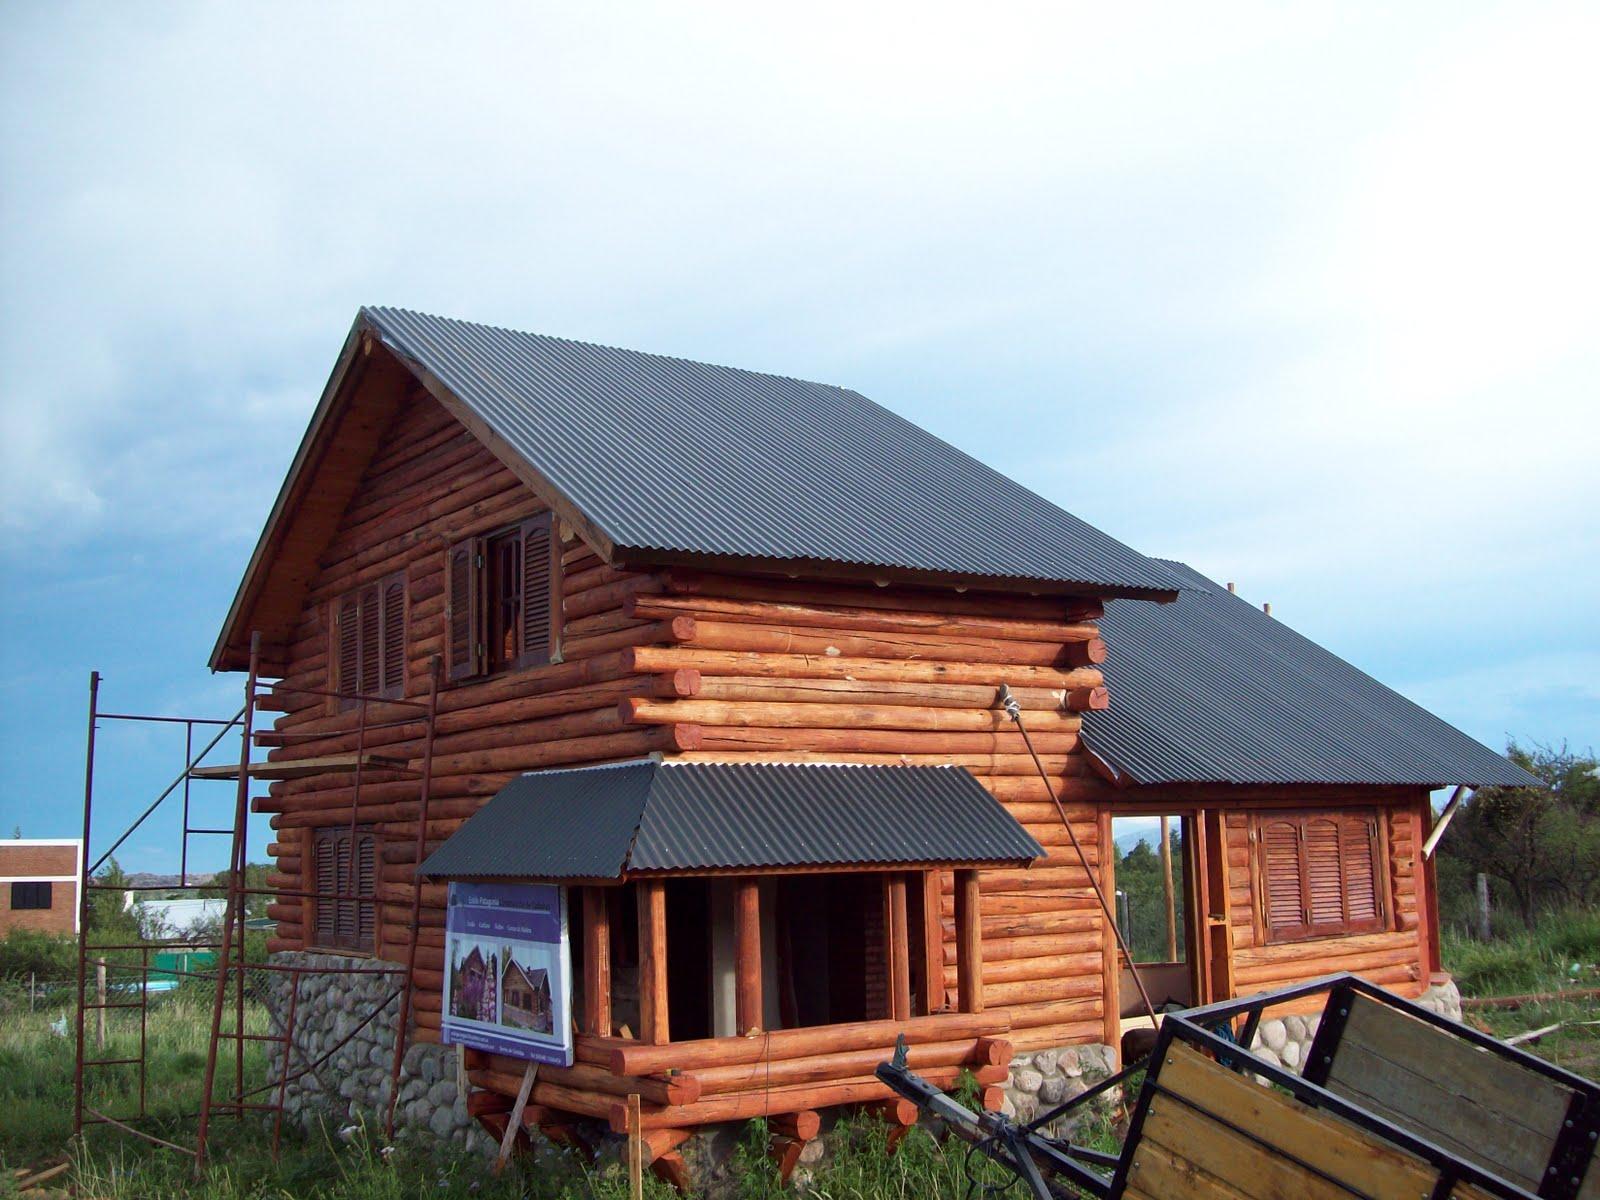 Arquitectura en madera construcci n en madera - Arquitectura en madera ...